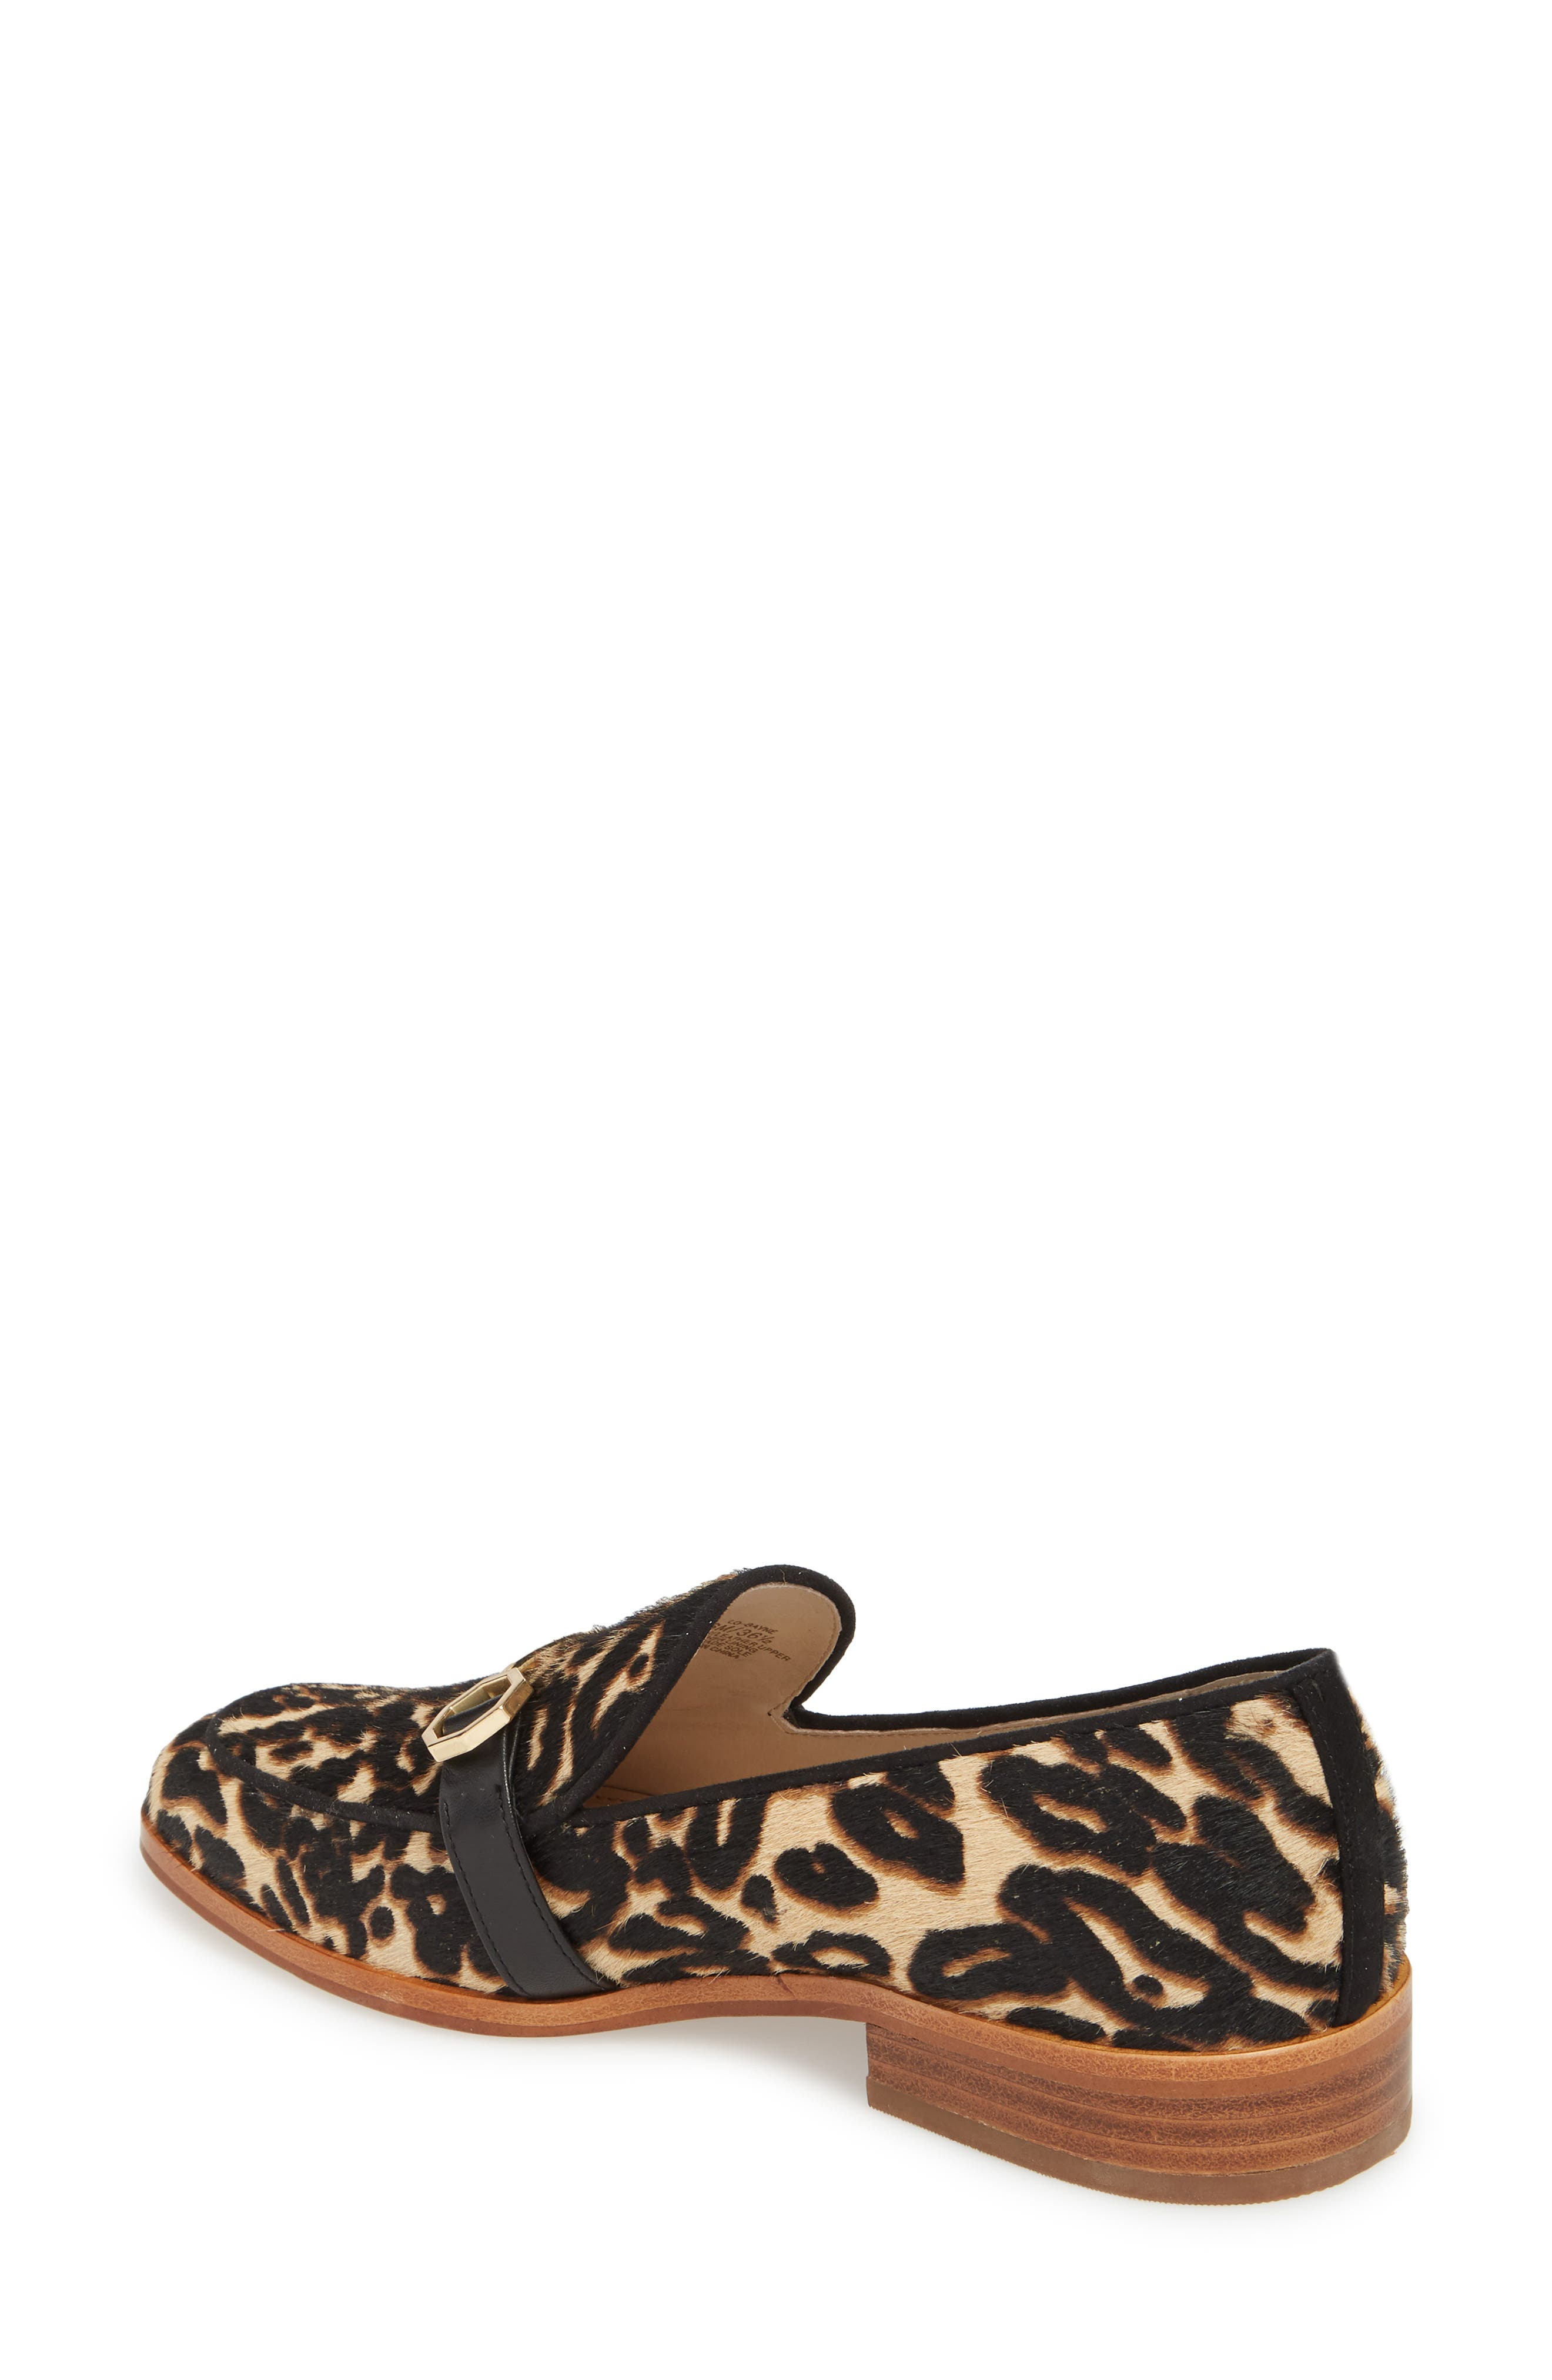 Bayne Genuine Calf Hair Loafer,                             Alternate thumbnail 2, color,                             Leopard Pony Hair